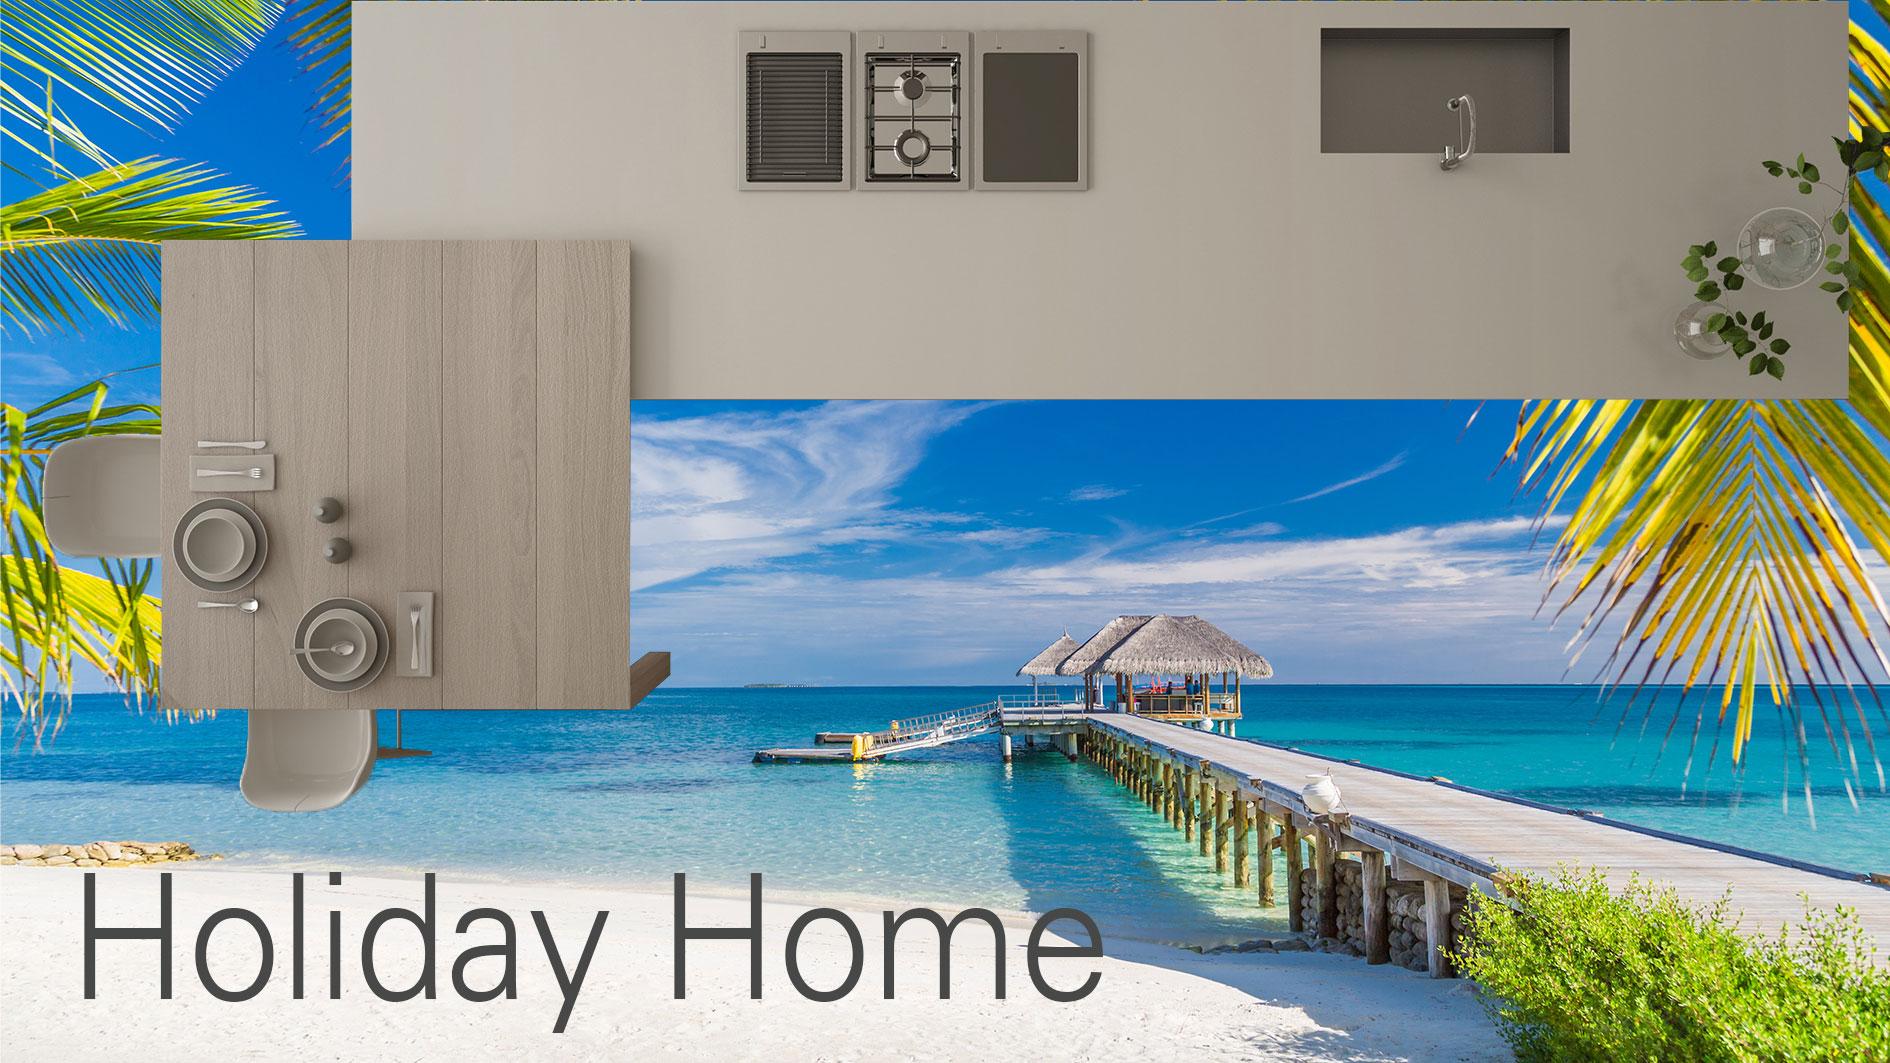 InVIDO Inspirations Holiday Home